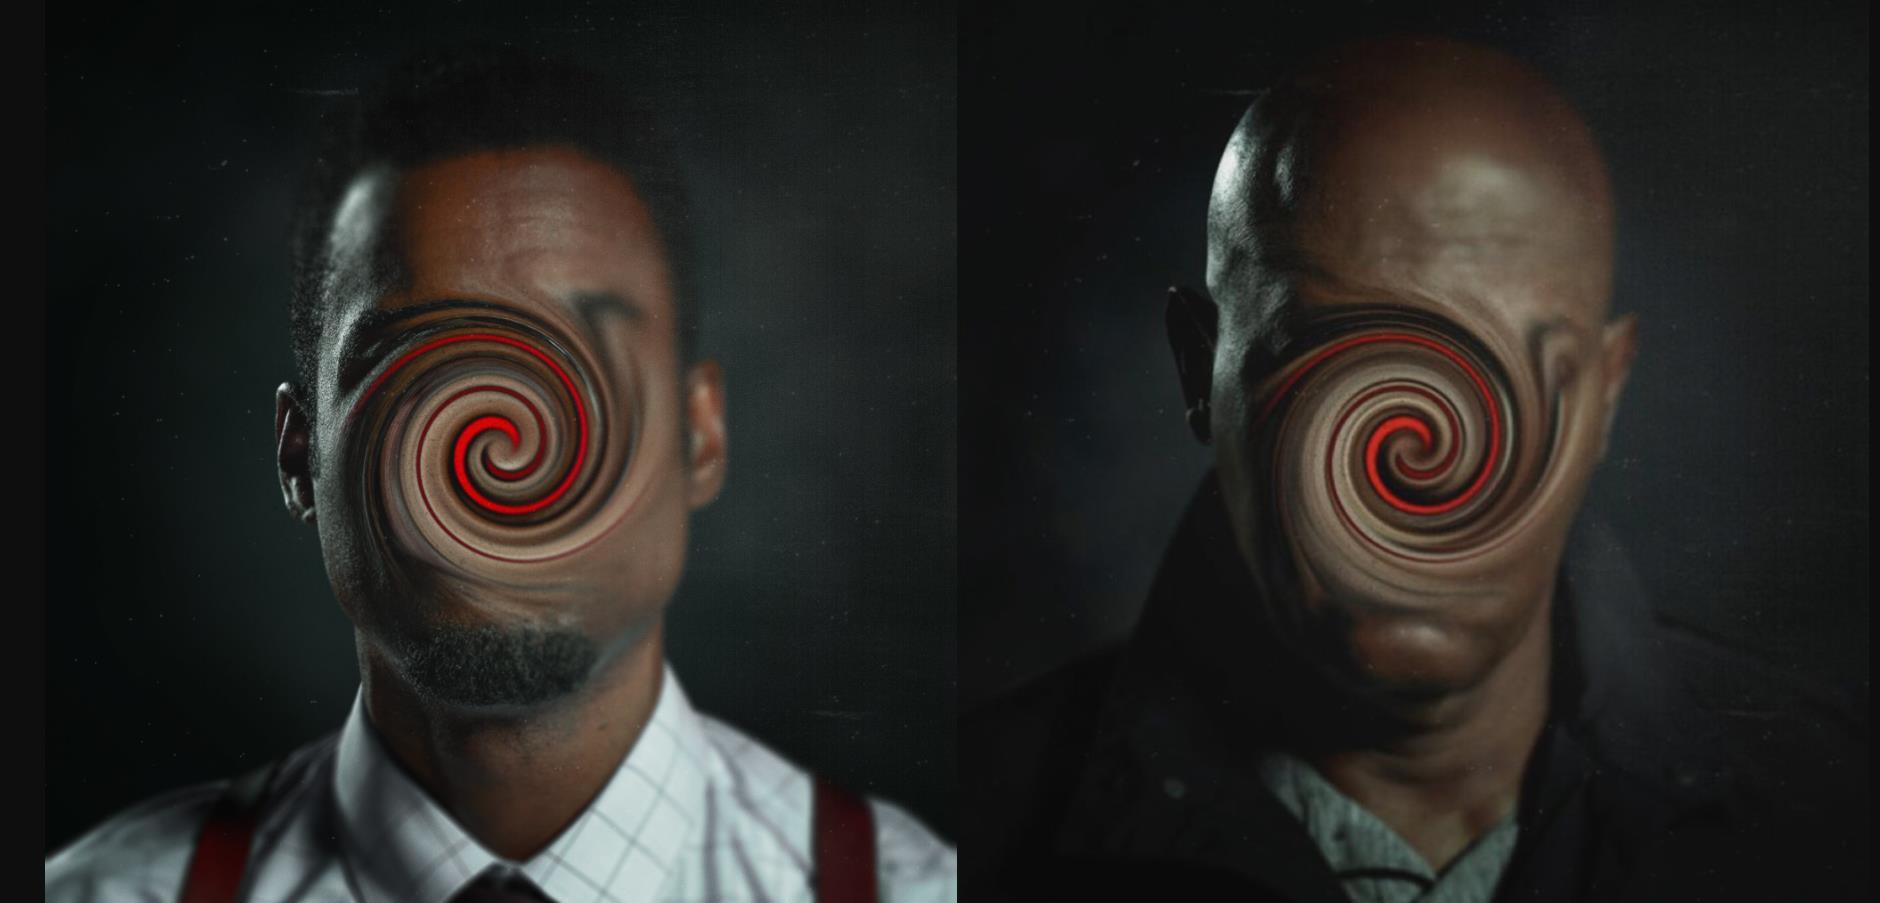 Espiral: O Legado de Jogos Mortais receberá trailer amanhã (30), veja novos pôsteres